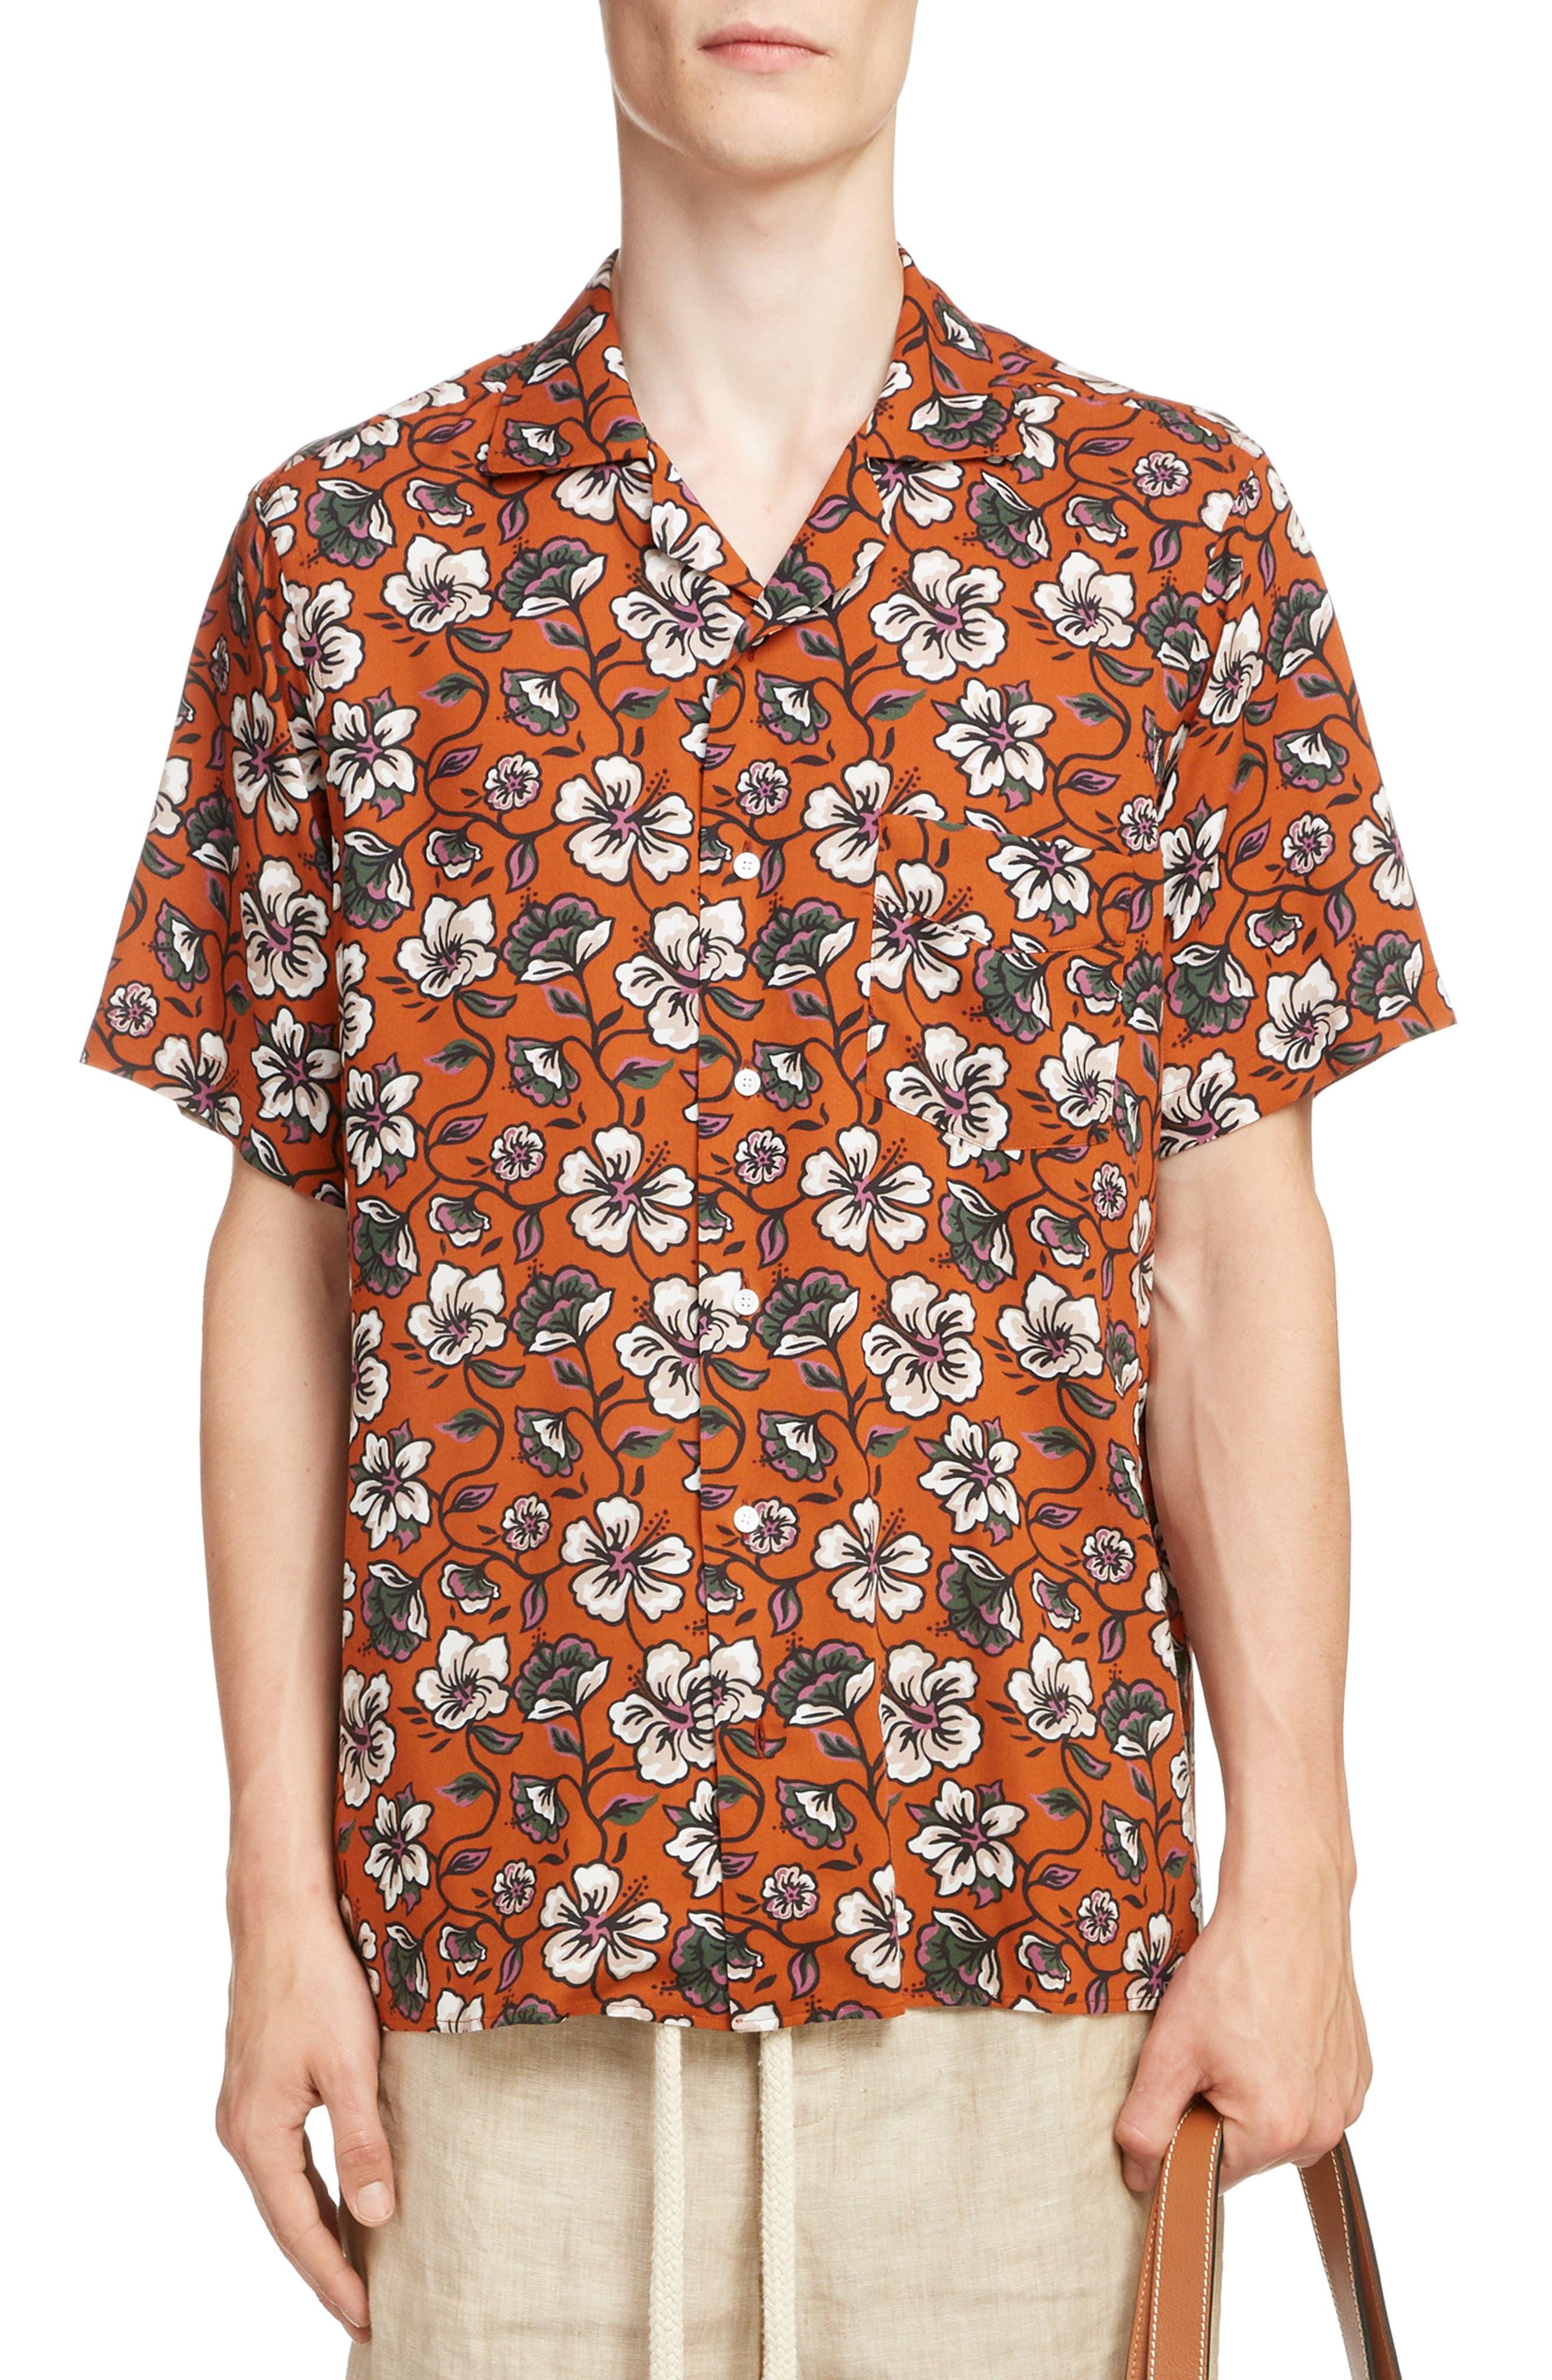 LOEWE,                             Floral Print Camp Shirt,                             Main thumbnail 1, color,                             2103-WHITE/ BROWN